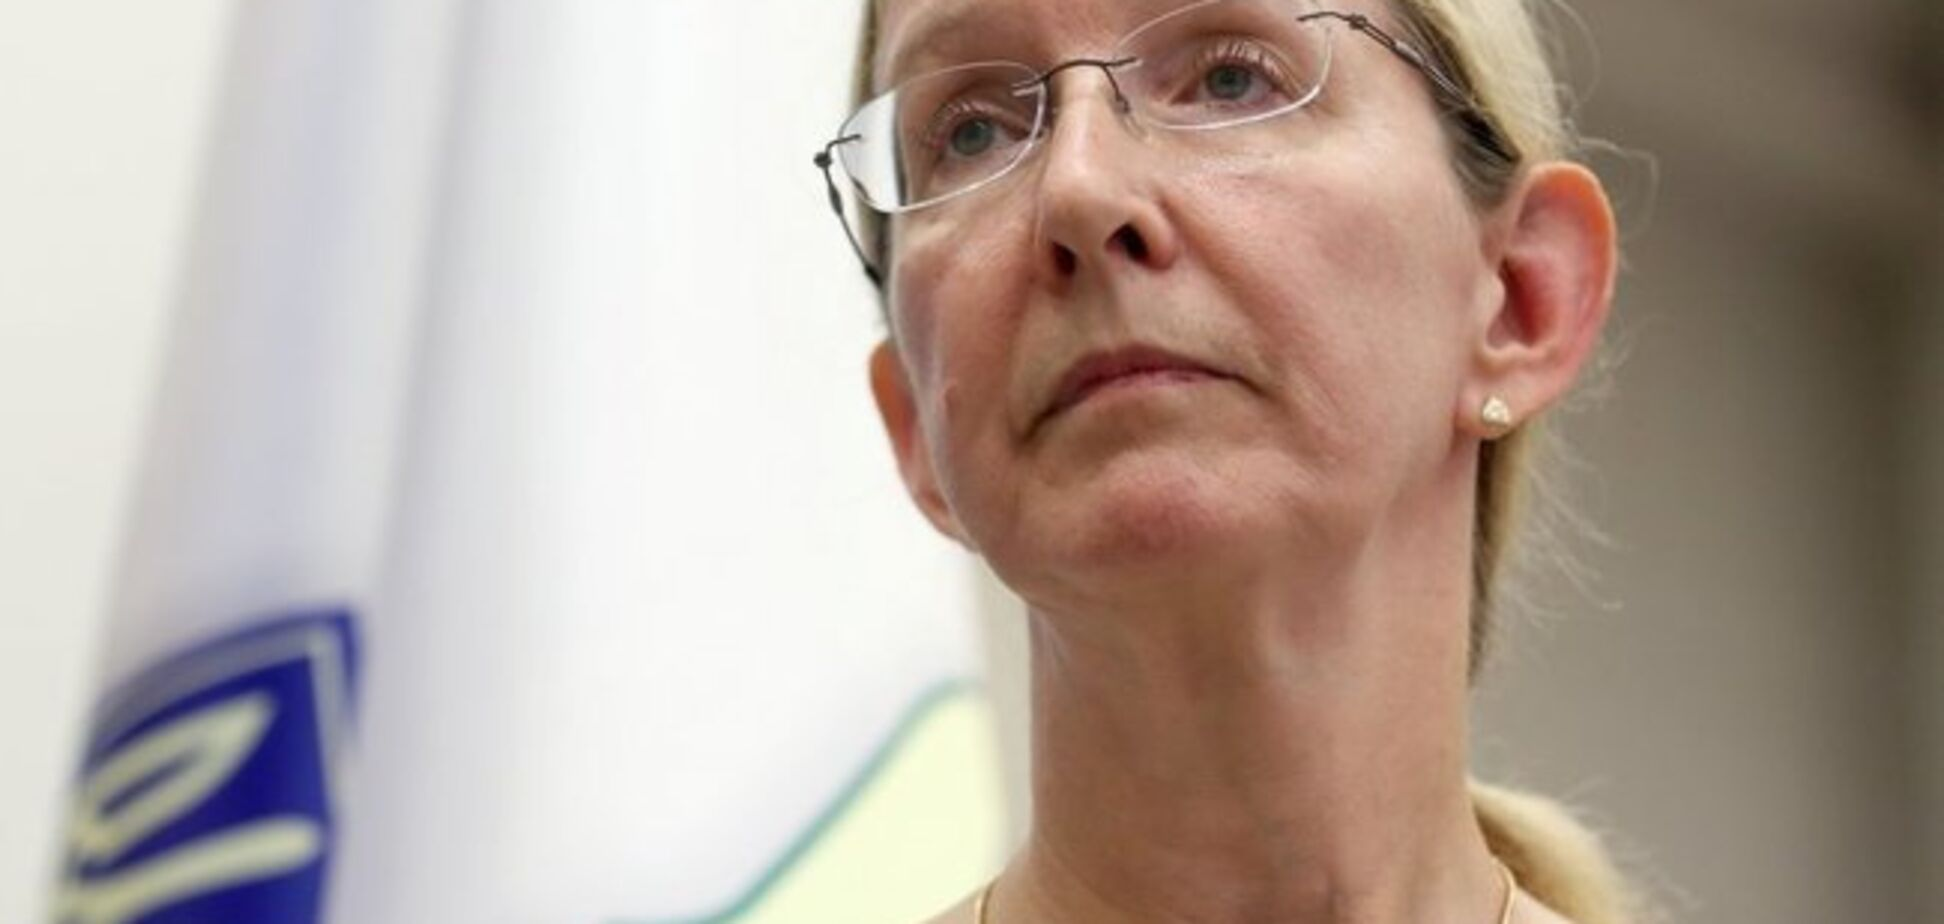 До 25 тысяч: Супрун заявила о резком росте зарплат у врачей